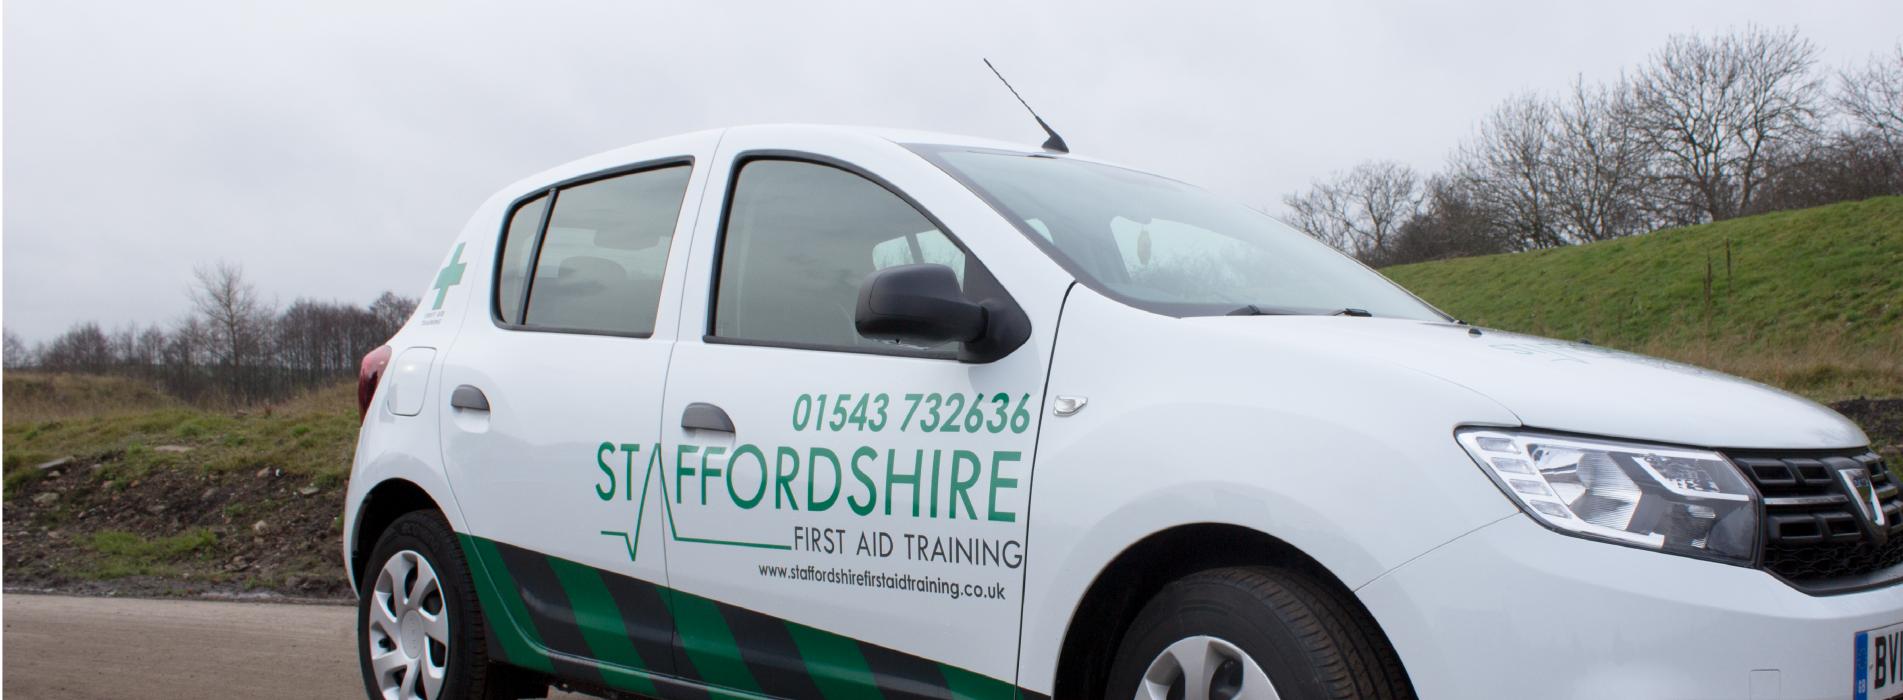 Chelmsford first aid training